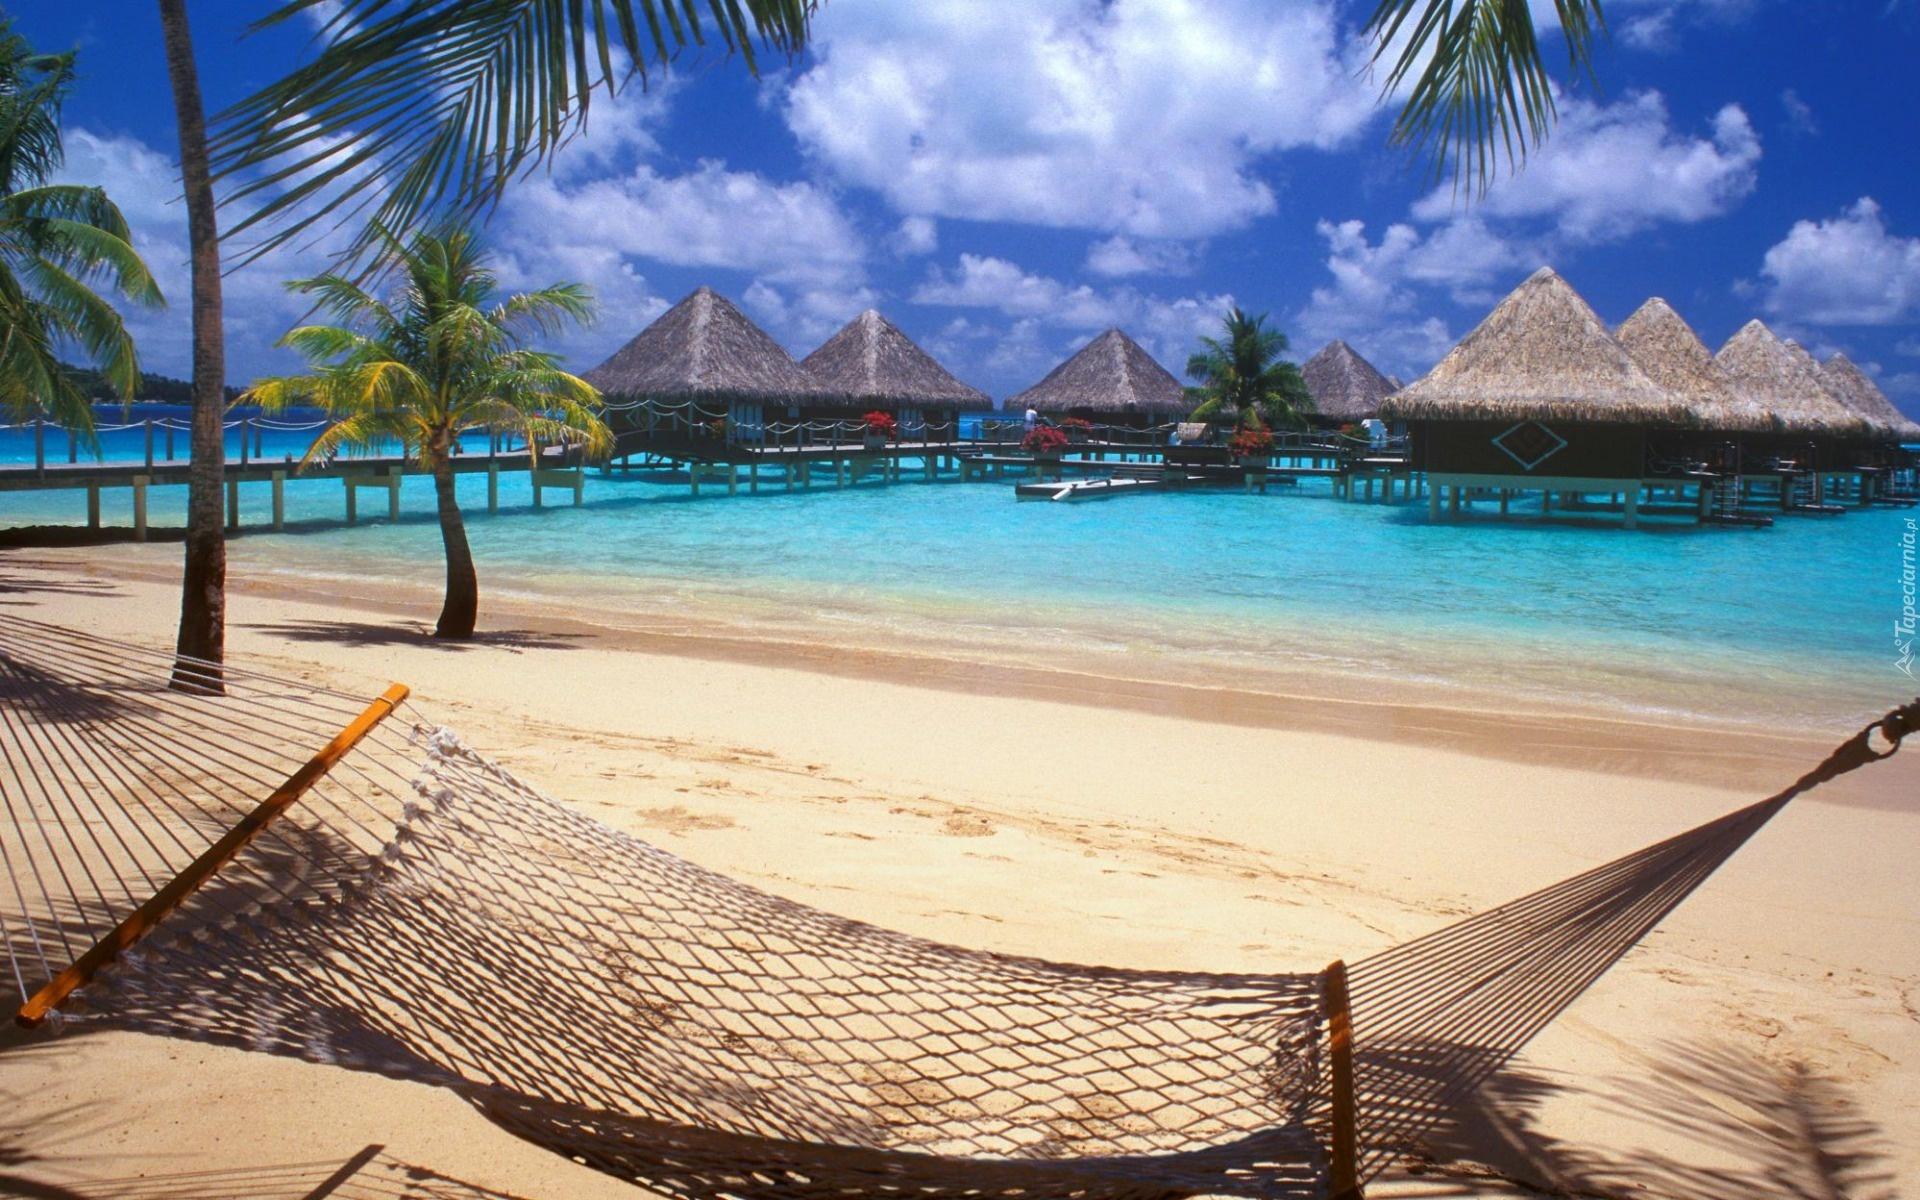 Plaża, Palmy, Hamak, Molo, Domy, Na, Palach, Bora Bora, Wyspa, Ocean